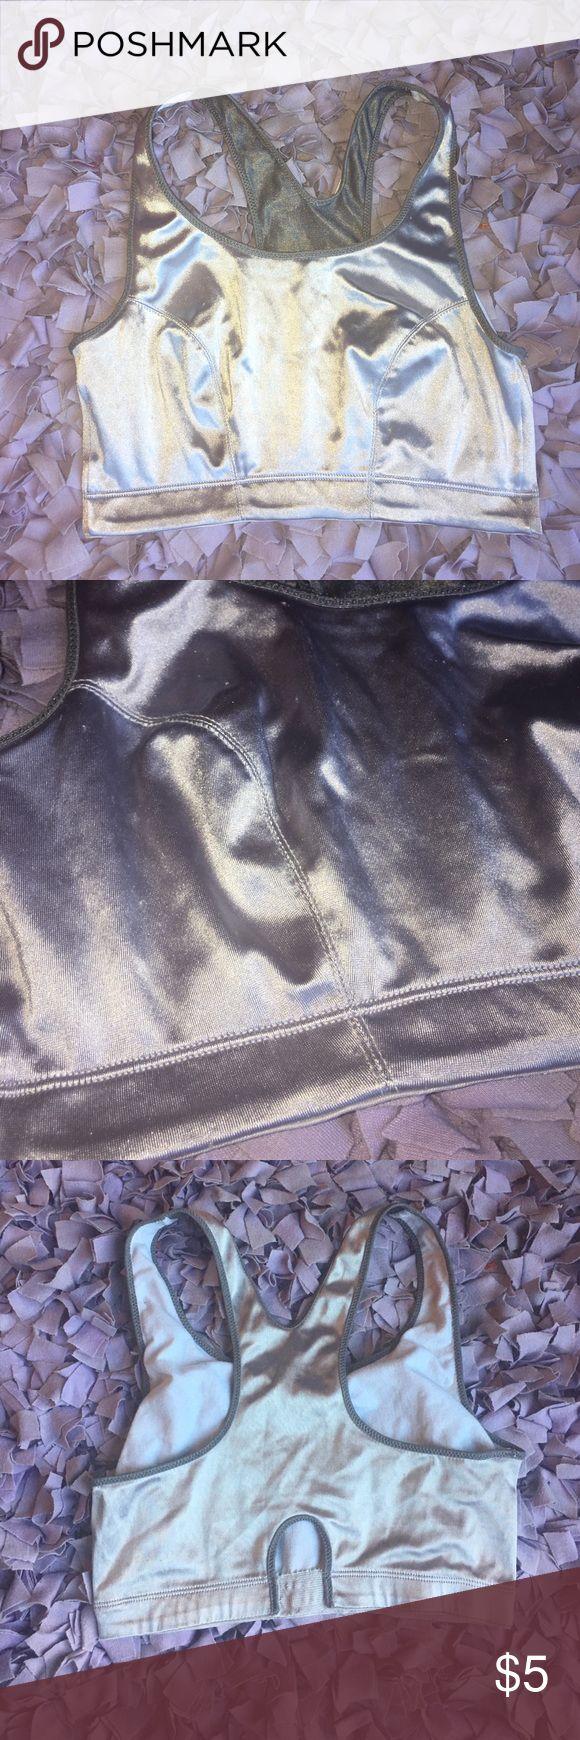 VS metallic sports bra Metallic silver soft sorts bra. Victoria's Secret Intimates & Sleepwear Bras